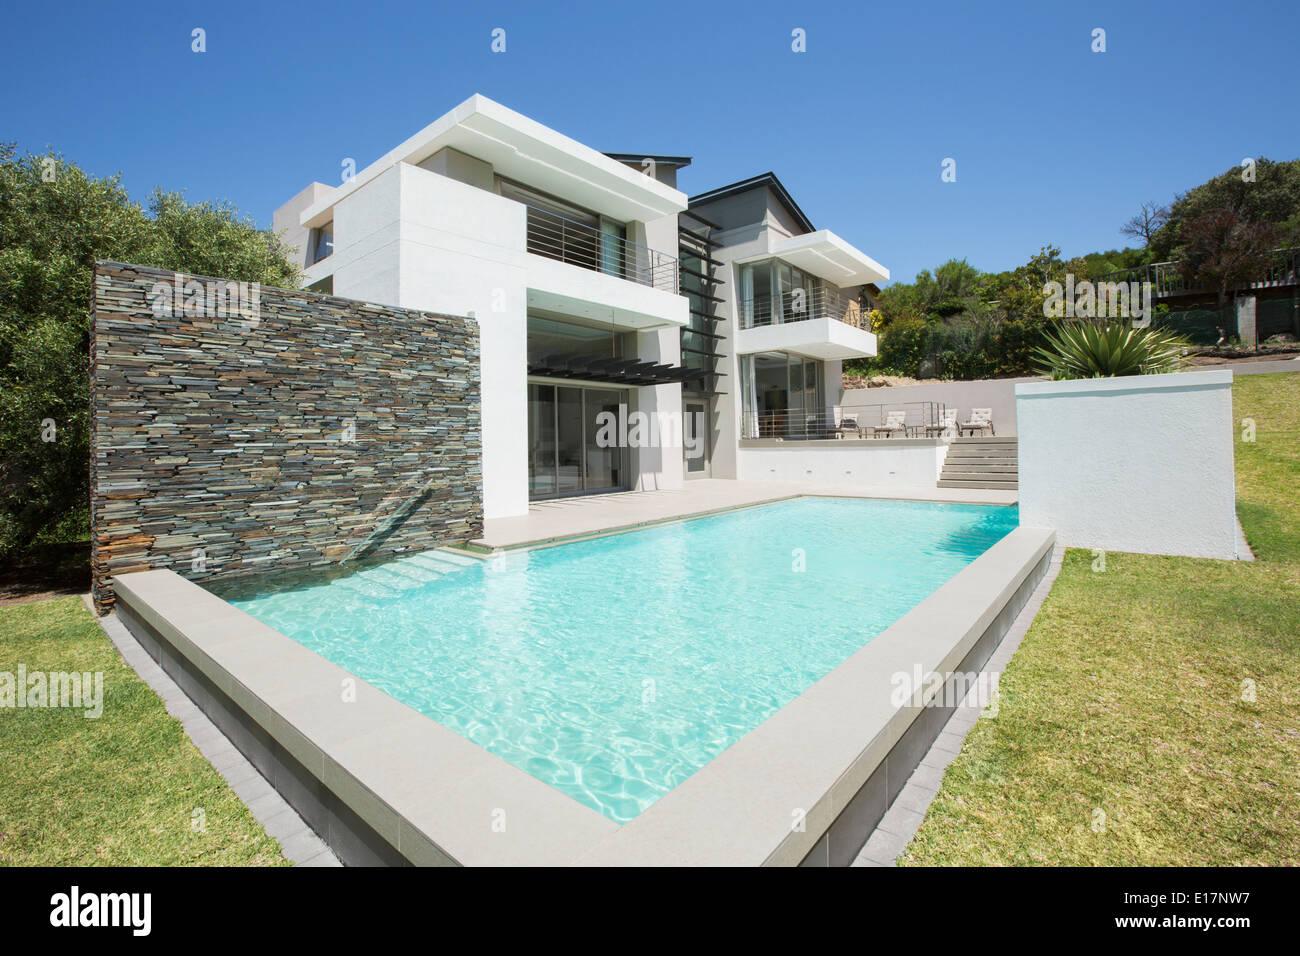 Modernes Haus und pool Stockfoto, Bild: 69626963 - Alamy